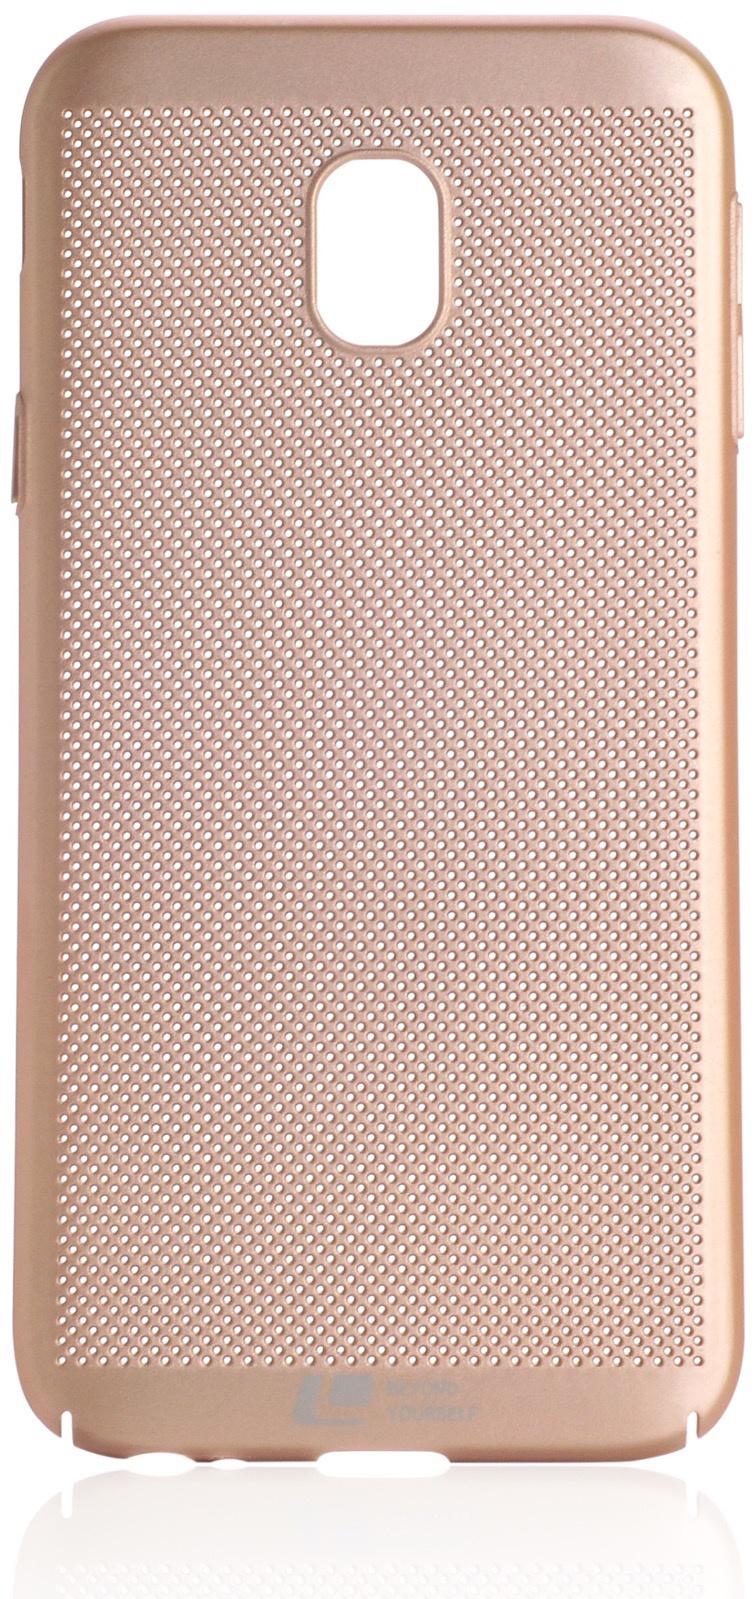 Чехол накладка Loopee пластик gold для Samsung Galaxy J3 2017 USA model,902869,золотой loopee чехол крышка loopee для apple iphone 6 пластик черный